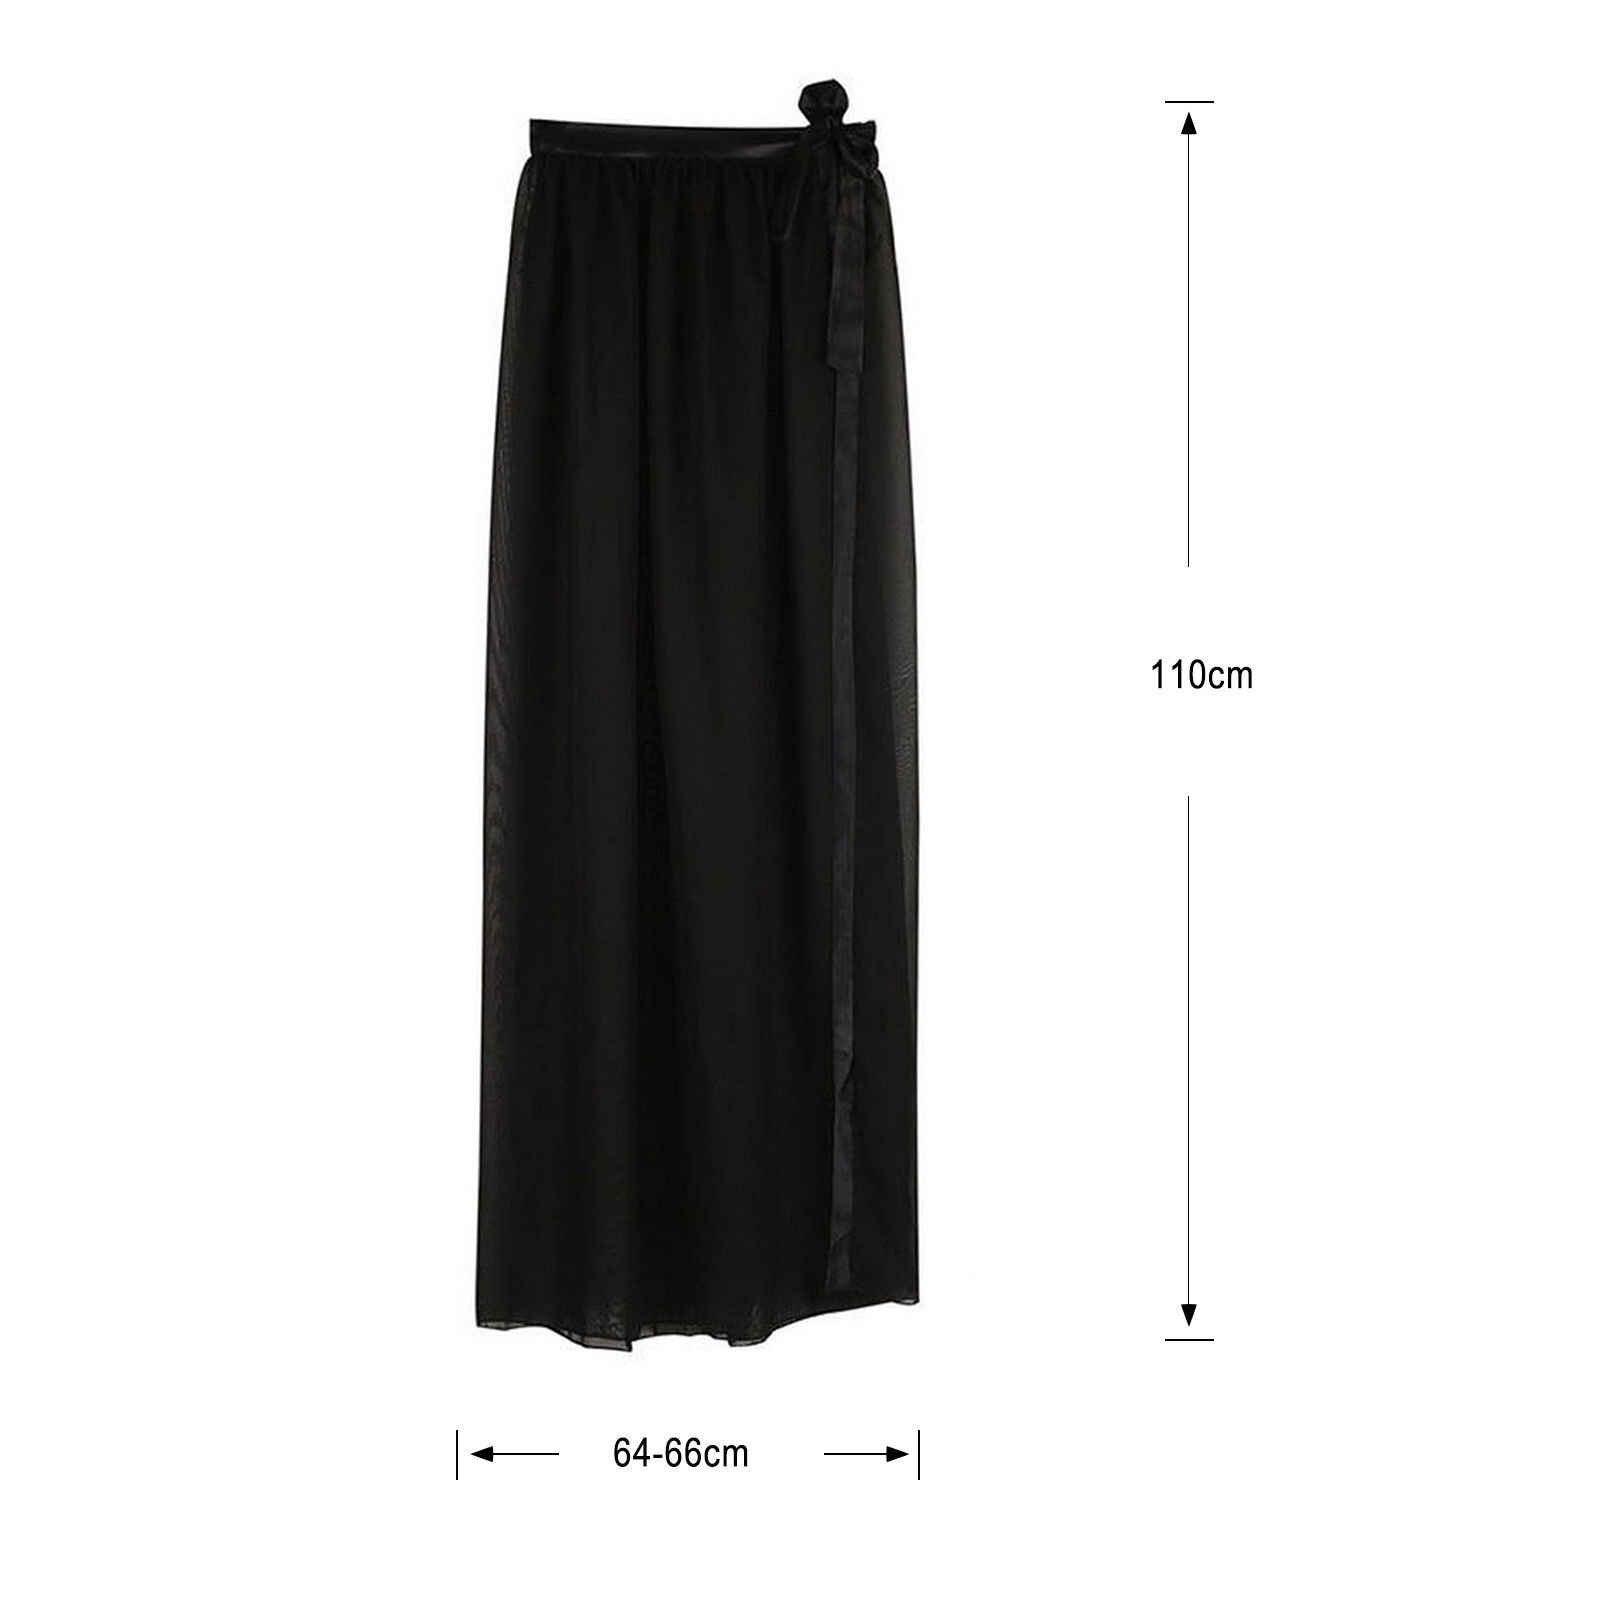 Hirigin 2019 Cover Up Beach Vrouwen Jurk Bikini Cover Ups Pure Candy Kleur Badpak Vrouwen Badpak Beachwear Wrap Mesh rok